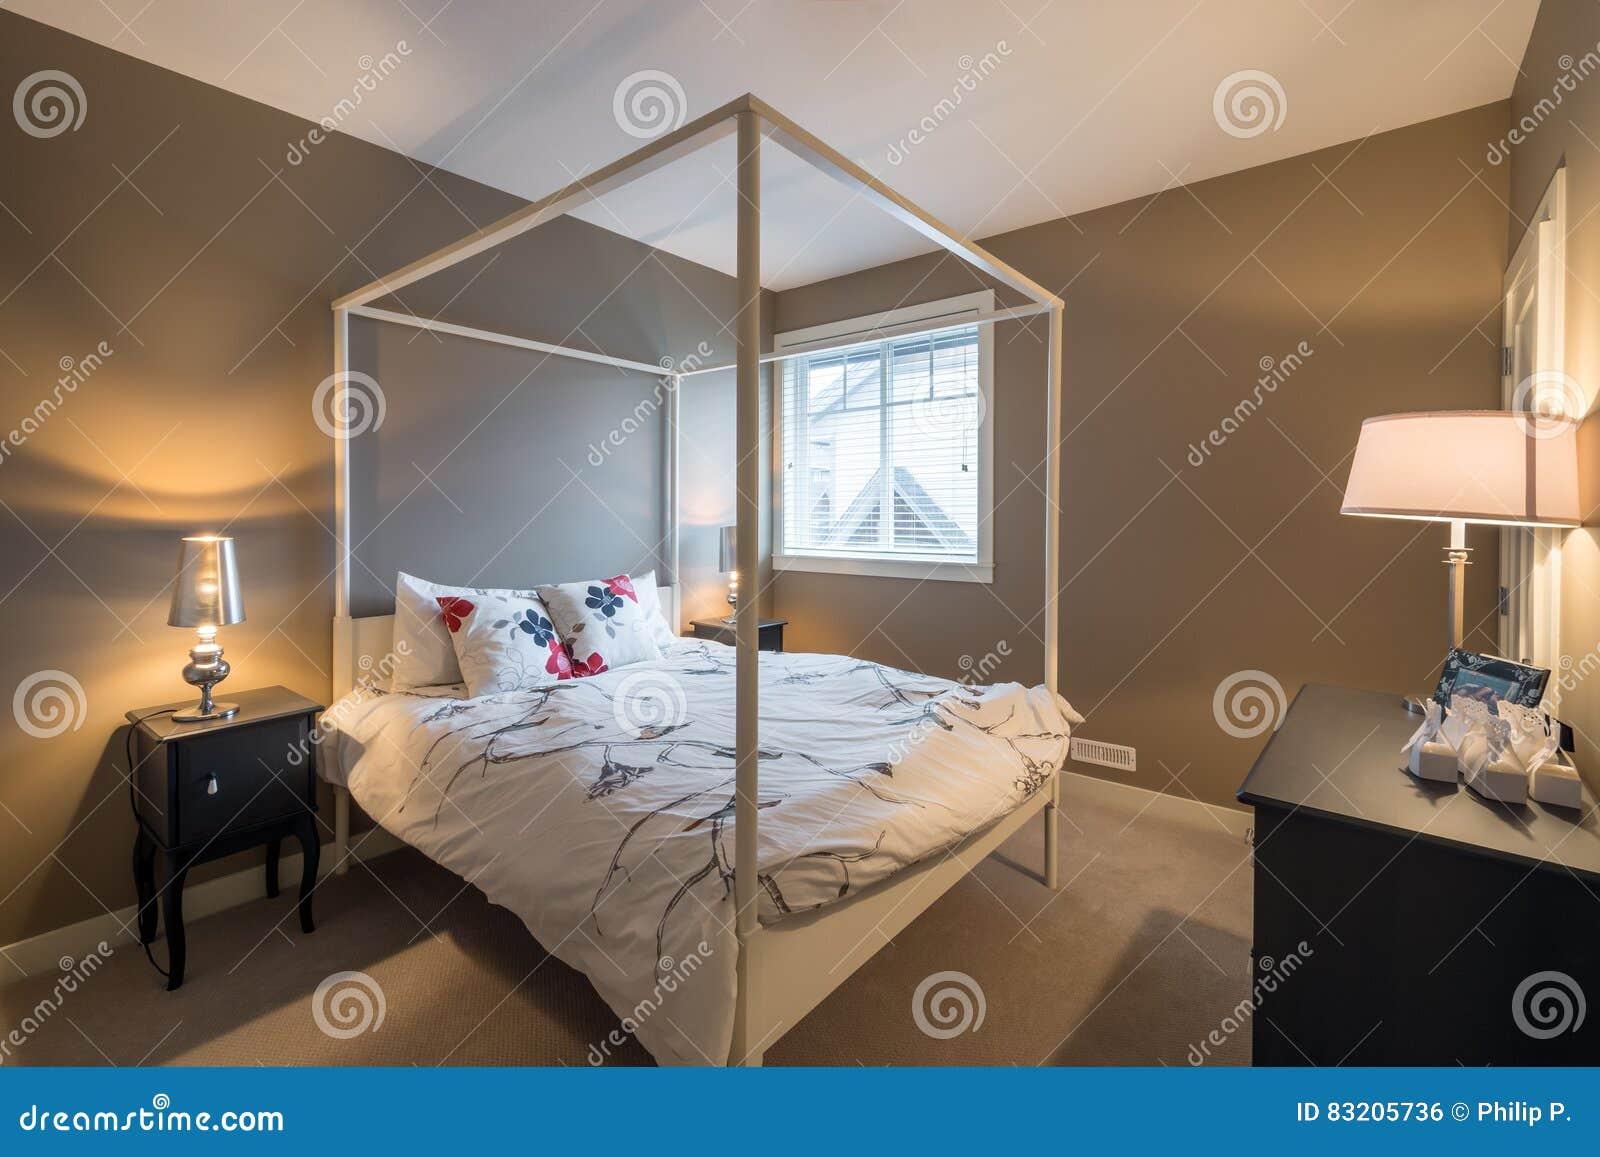 Beautiful Rustic Bedroom Interior Design Stock Photo Image Of Furnished Rustic 83205736